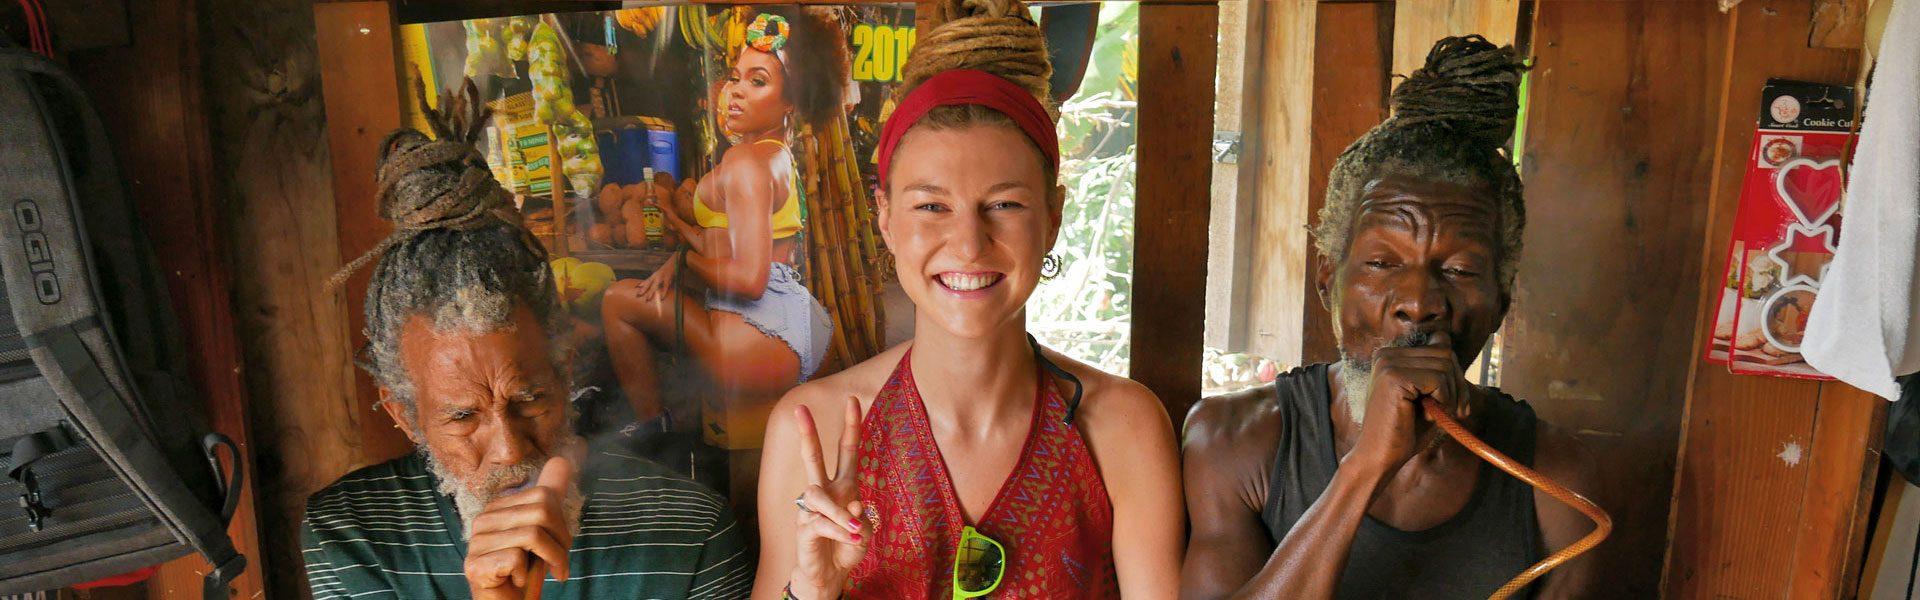 German dreadlock girl with Rastafarians smoking cannabis in Kingston, Jamaica